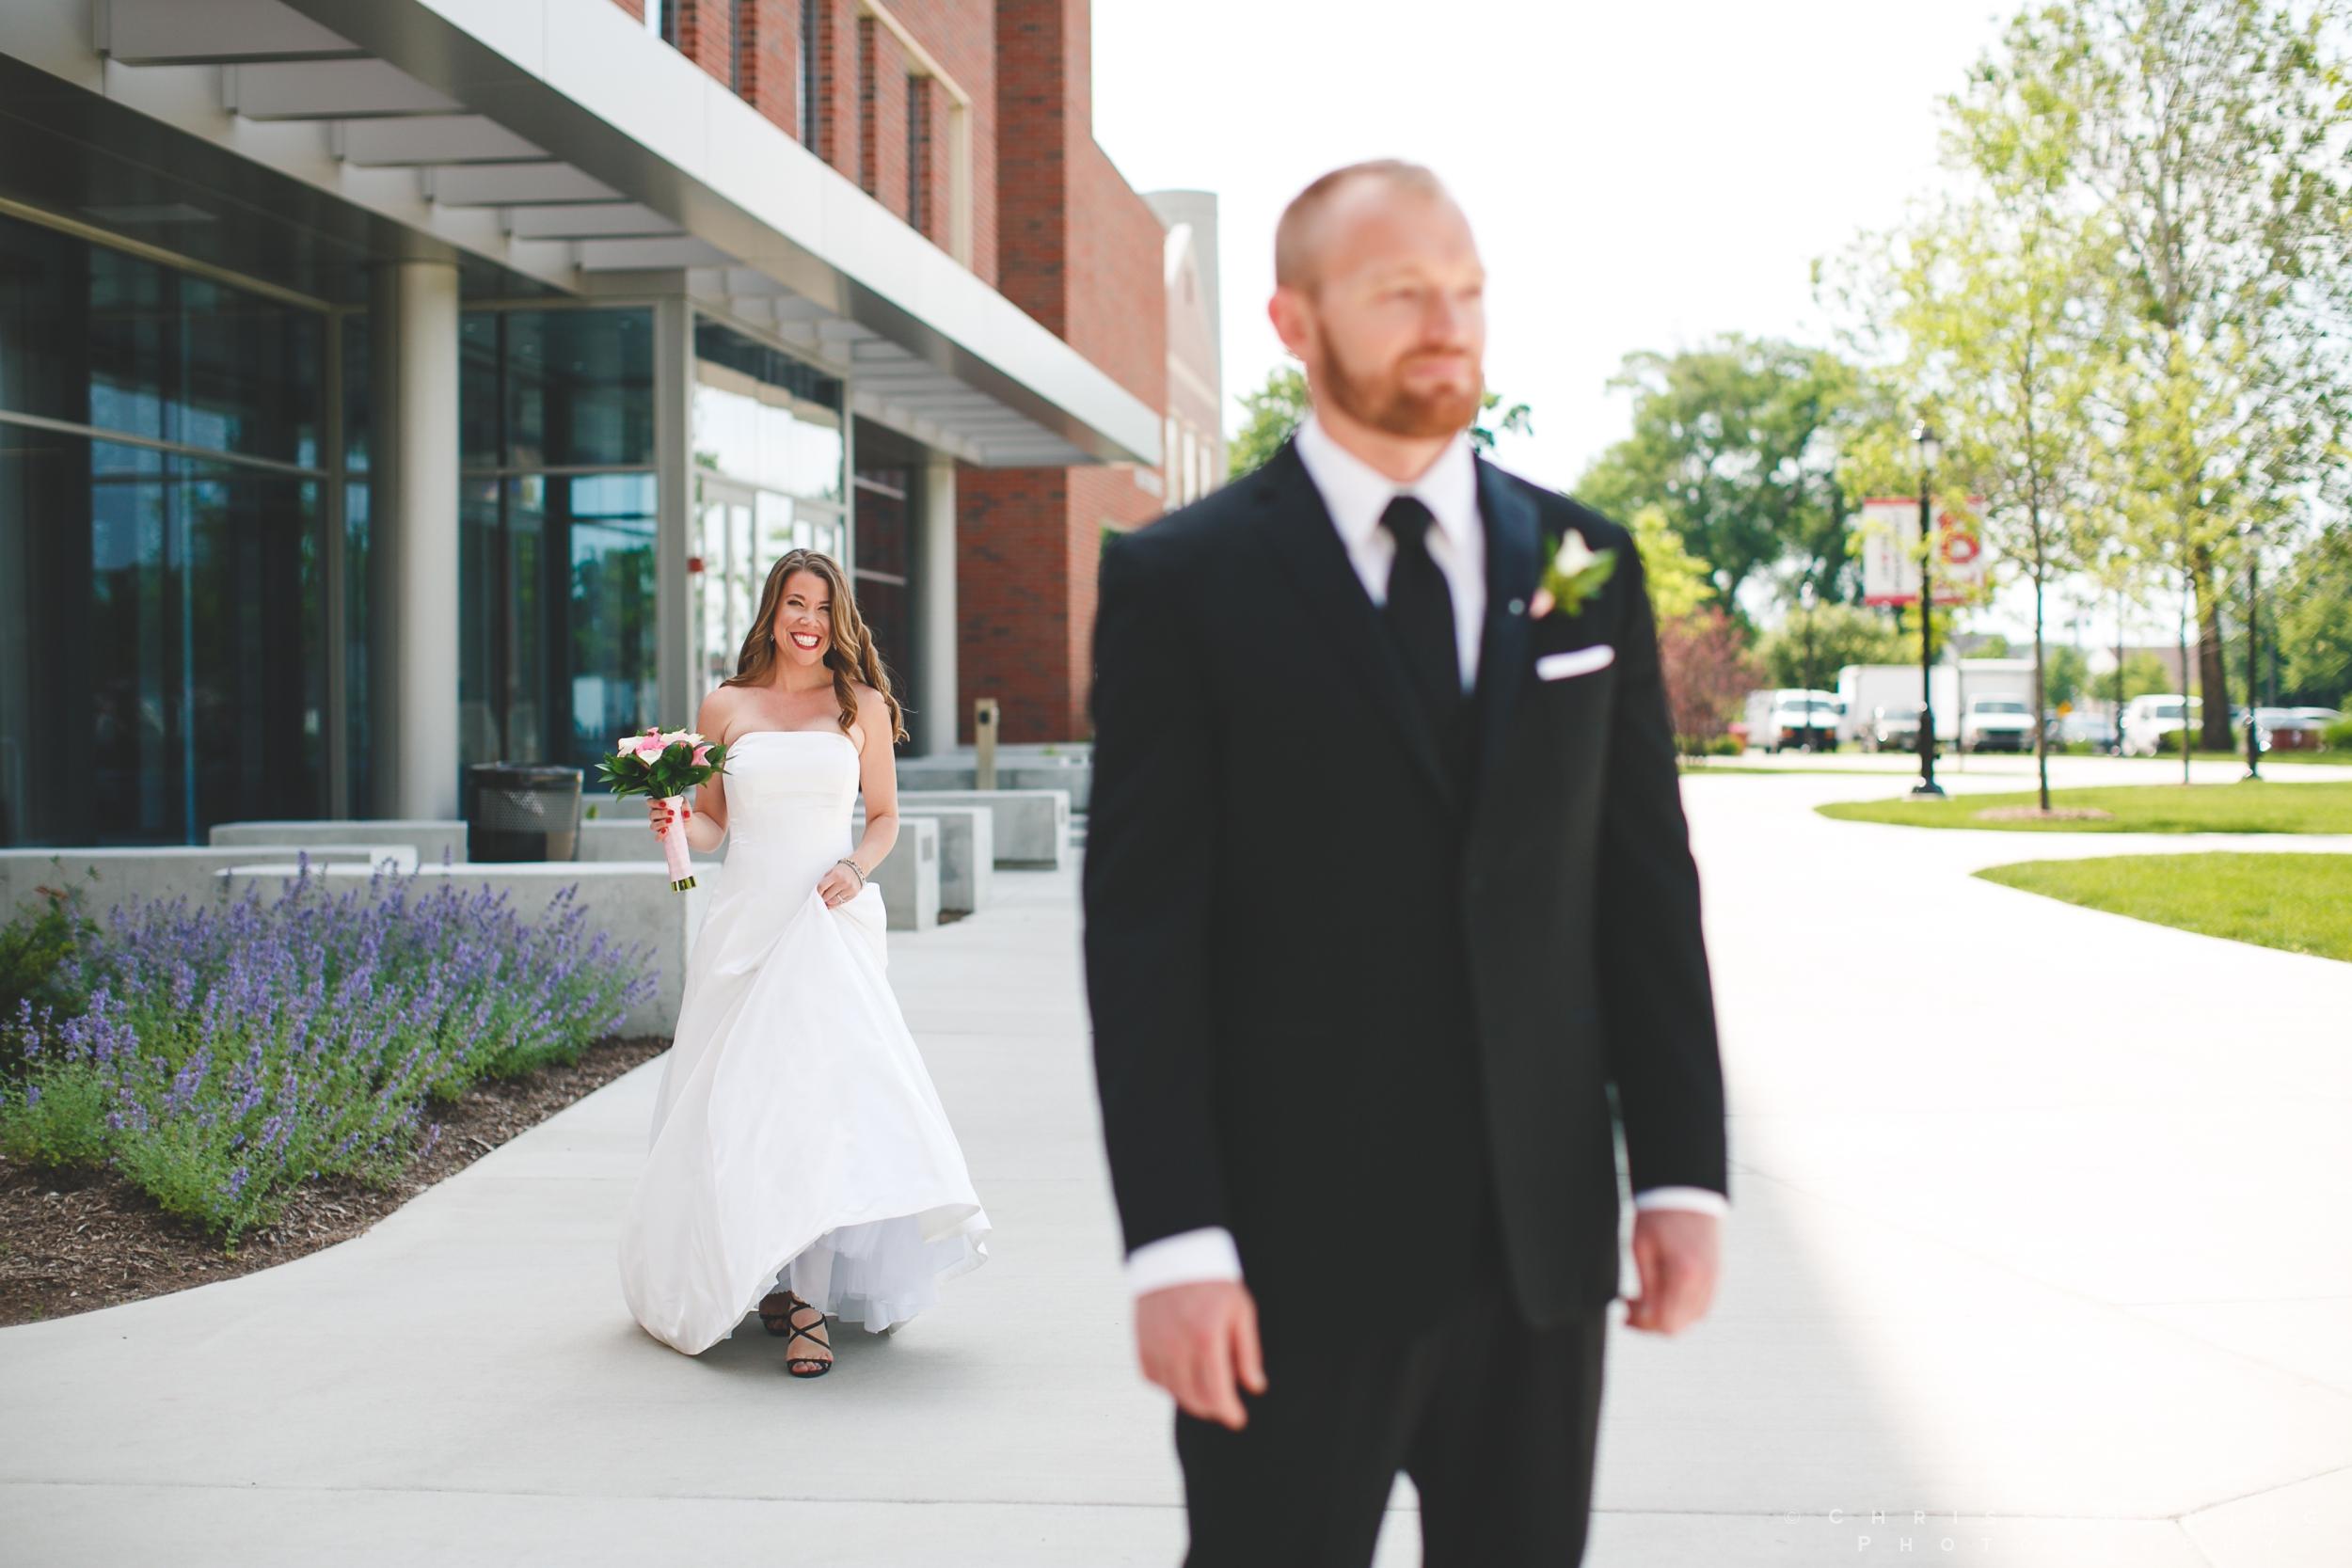 benedictine_lisle_wedding_photographer_0032.jpg